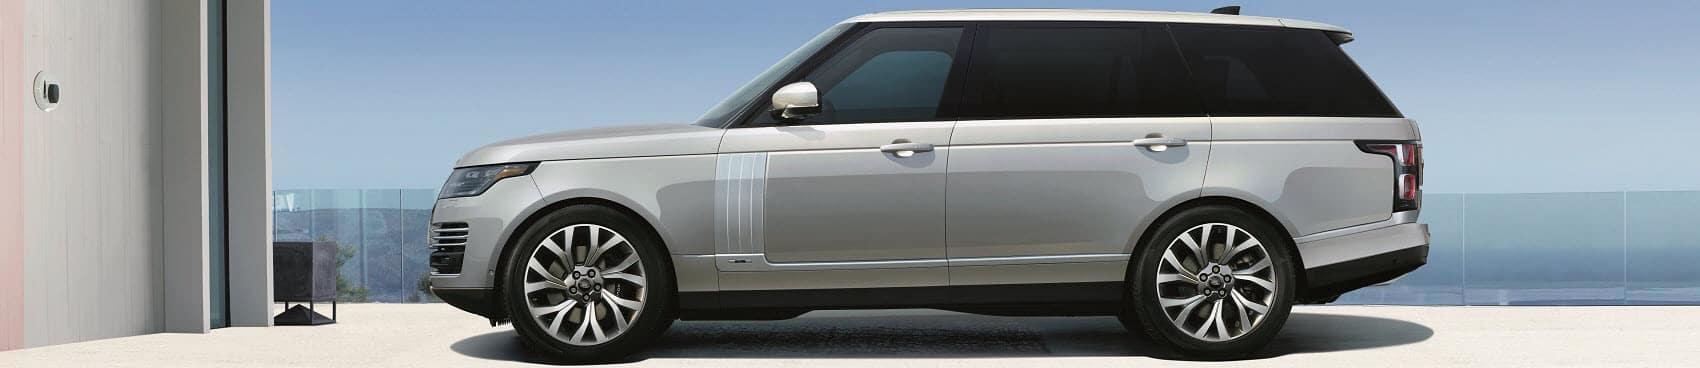 Range Rover Configurations